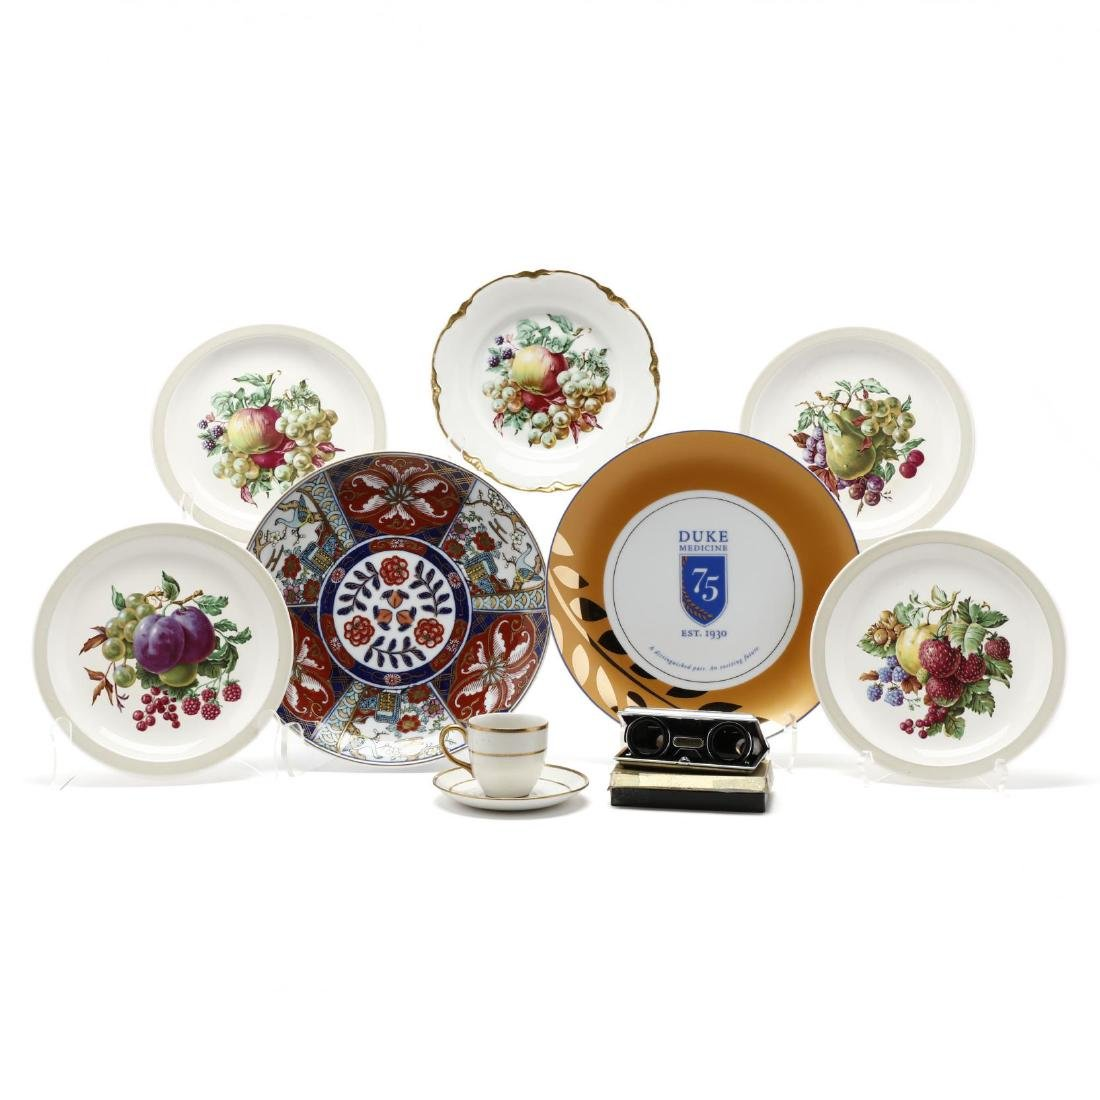 Assorted Vintage Porcelain and Opera Glasses